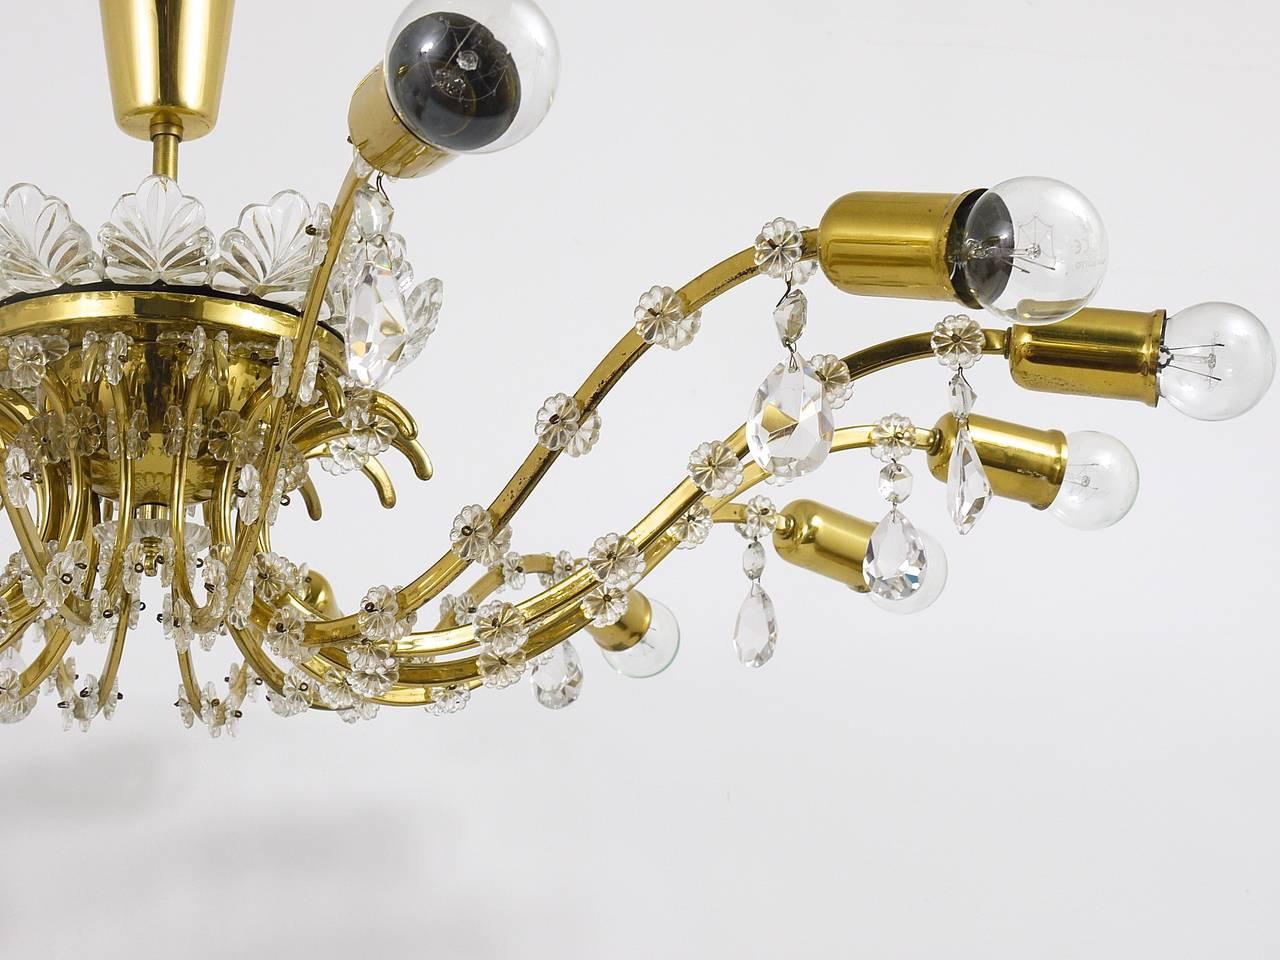 Huge Floral Lobmeyr Mid-Century Brass Crystal Chandelier, 1950s, Austria For Sale 1